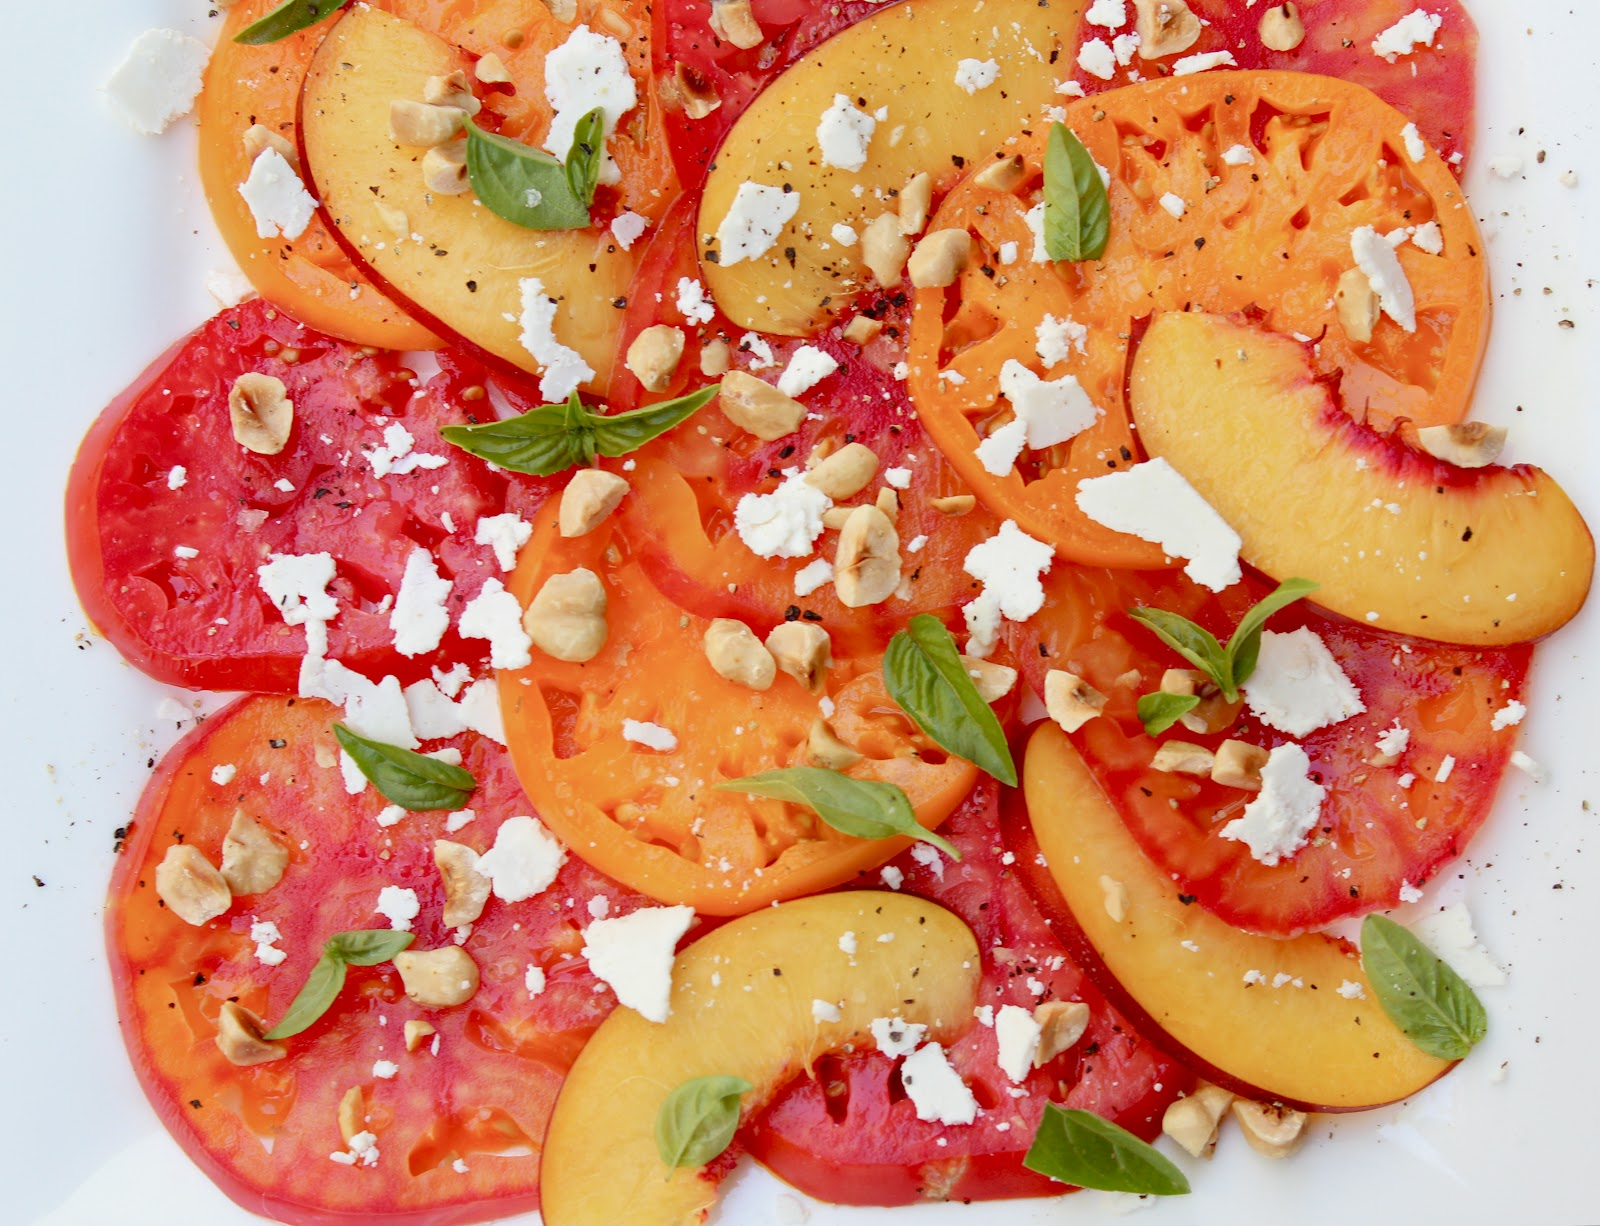 Heirloom Tomato And Nectarine Salad Recipes — Dishmaps